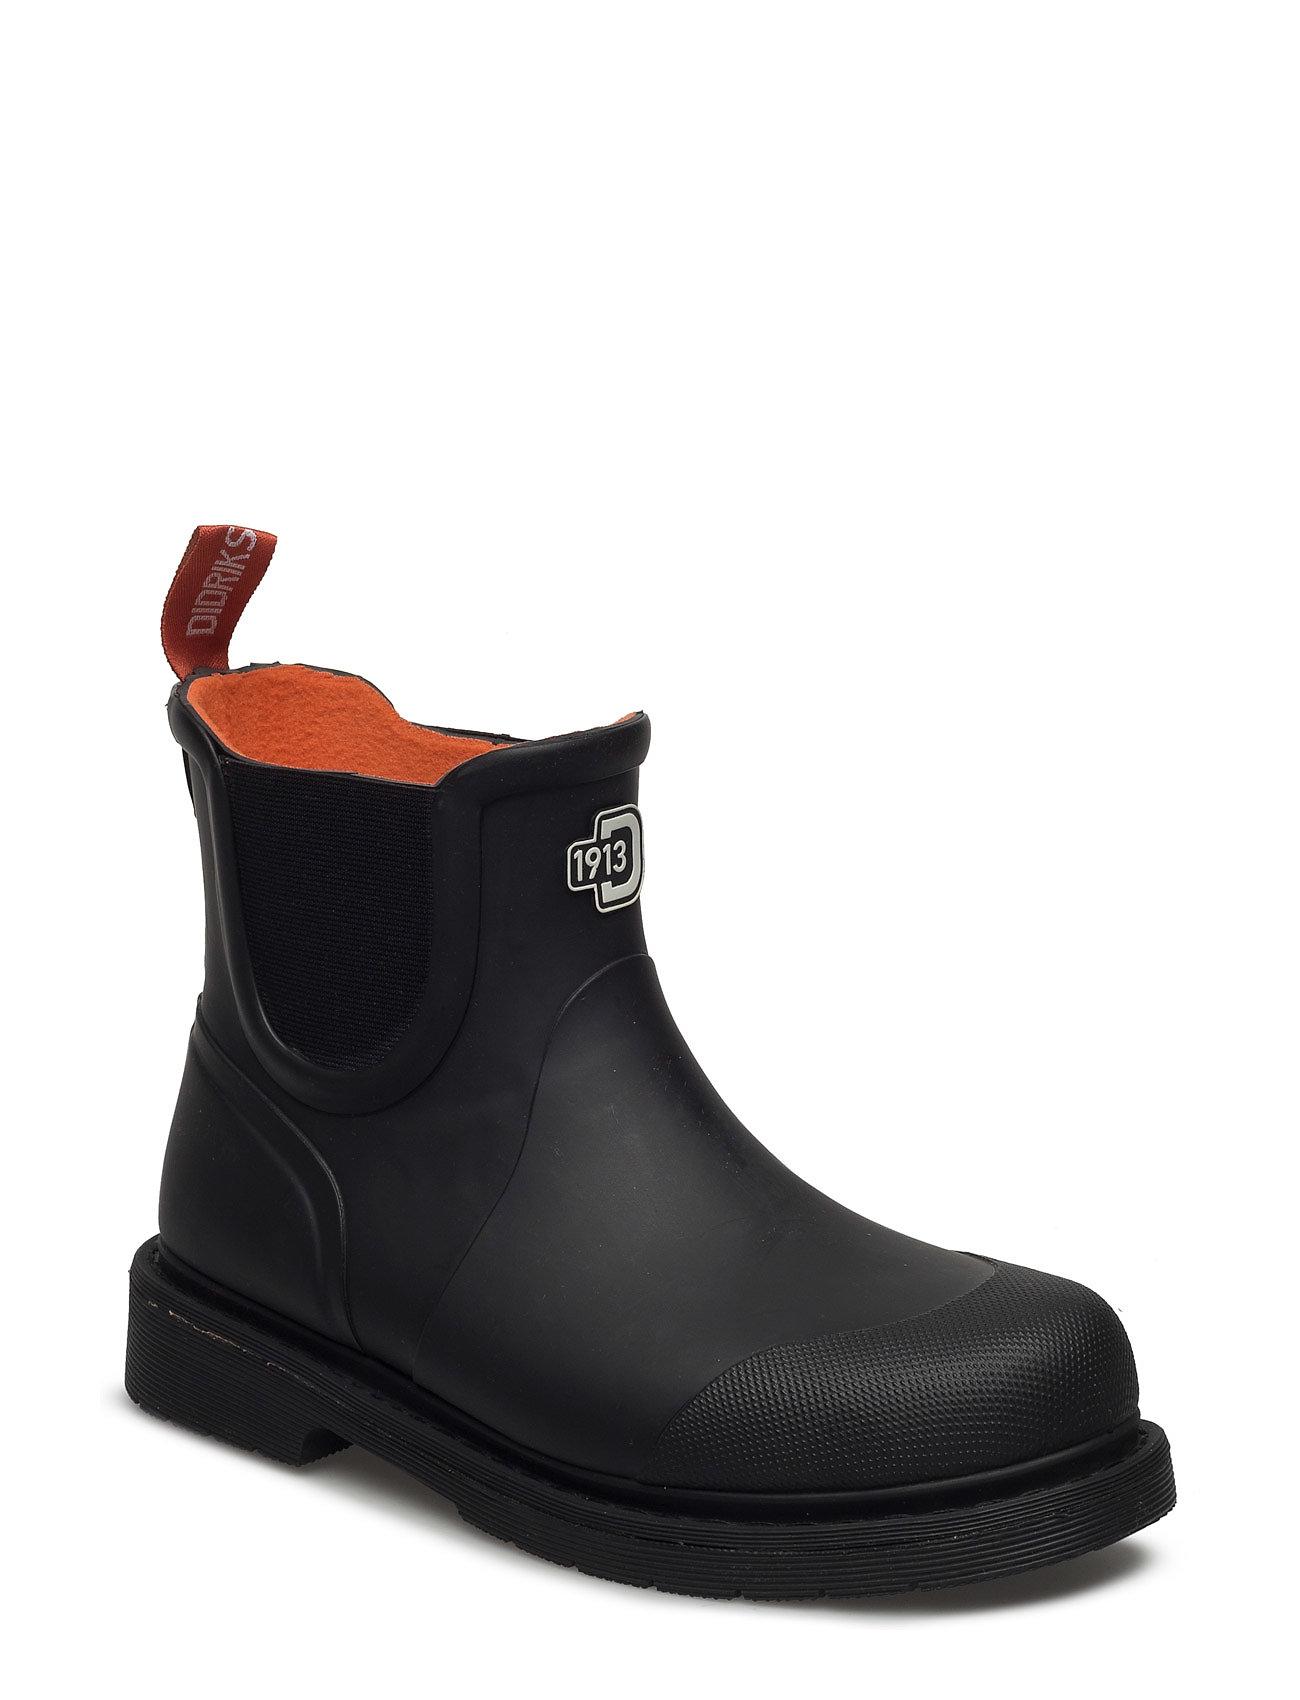 Vinga Wns Rbrboot Didriksons Støvler til Damer i Sort